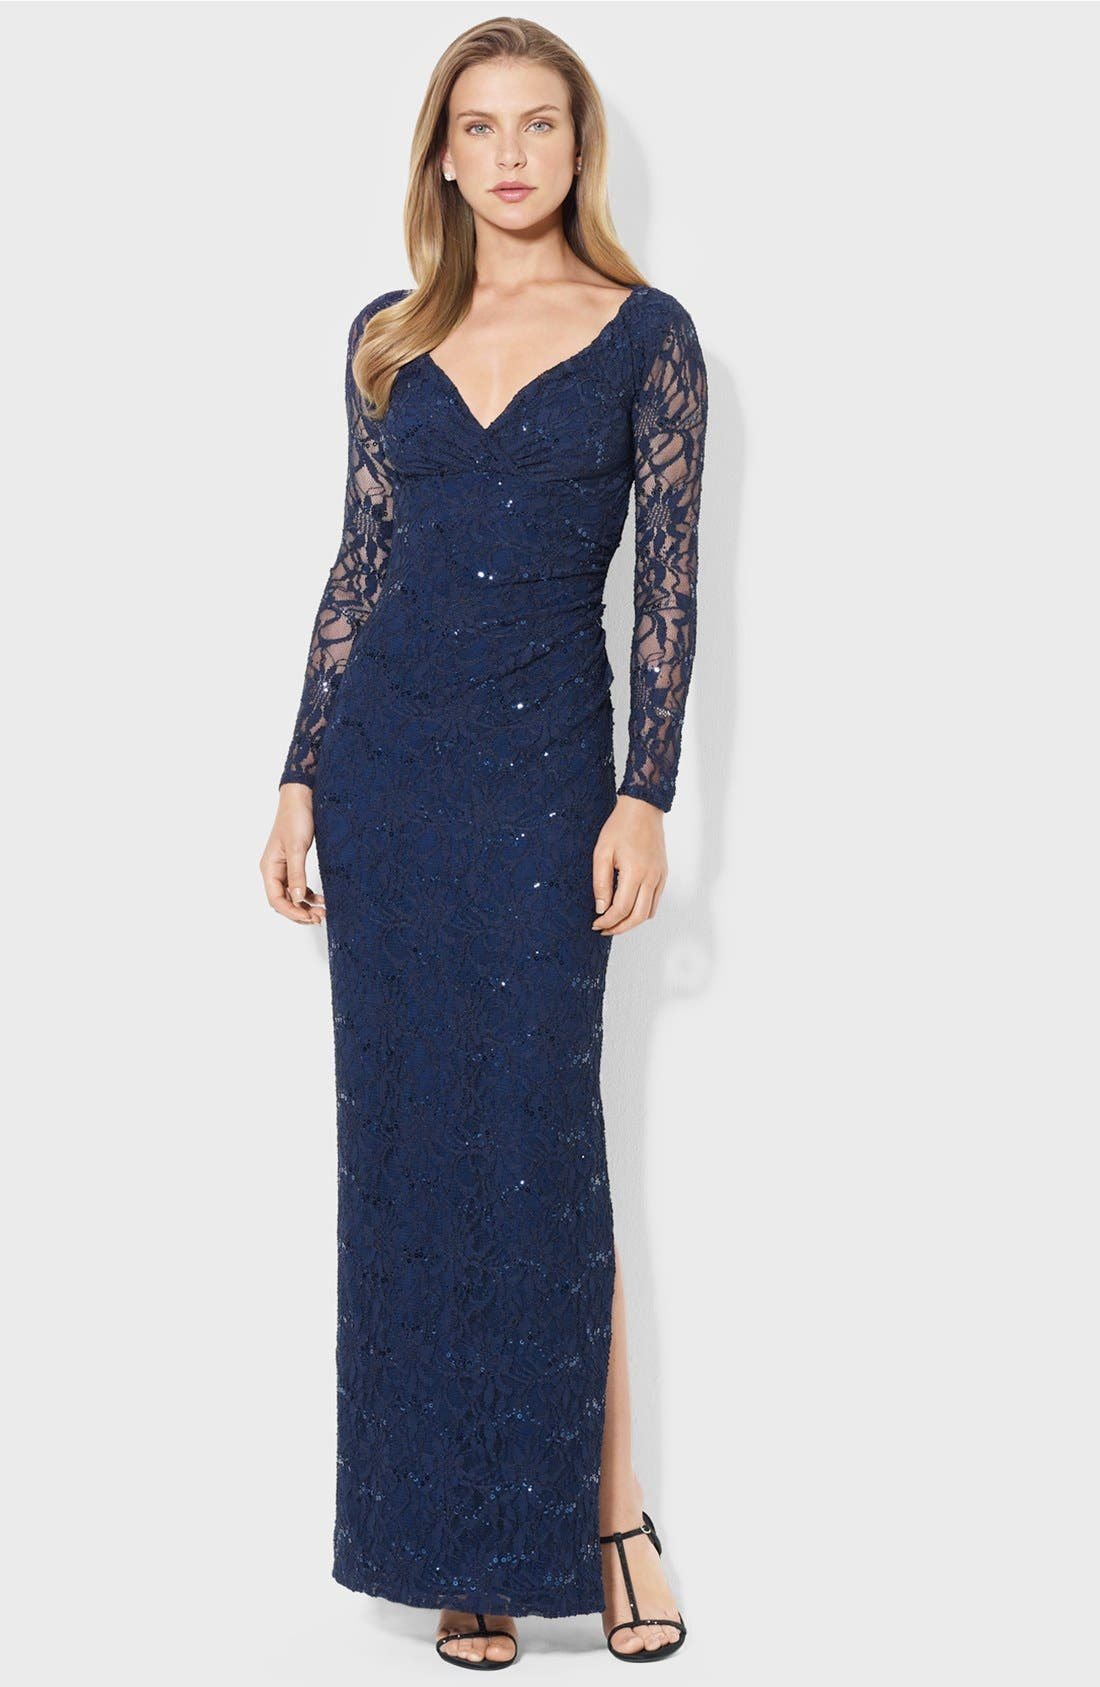 Alternate Image 1 Selected - Lauren Ralph Lauren Illusion Sleeve Lace Gown (Petite)